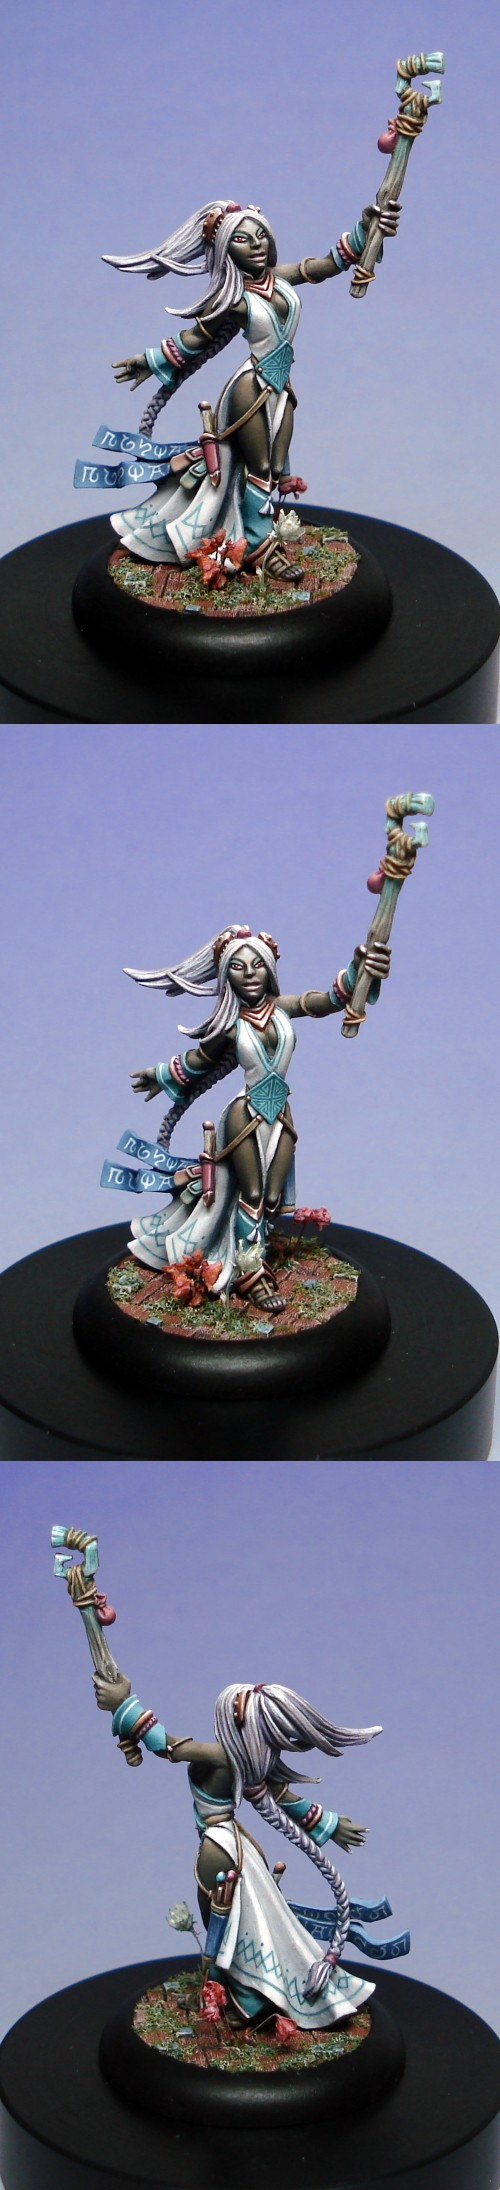 Sylphie - benevolent drow priestess